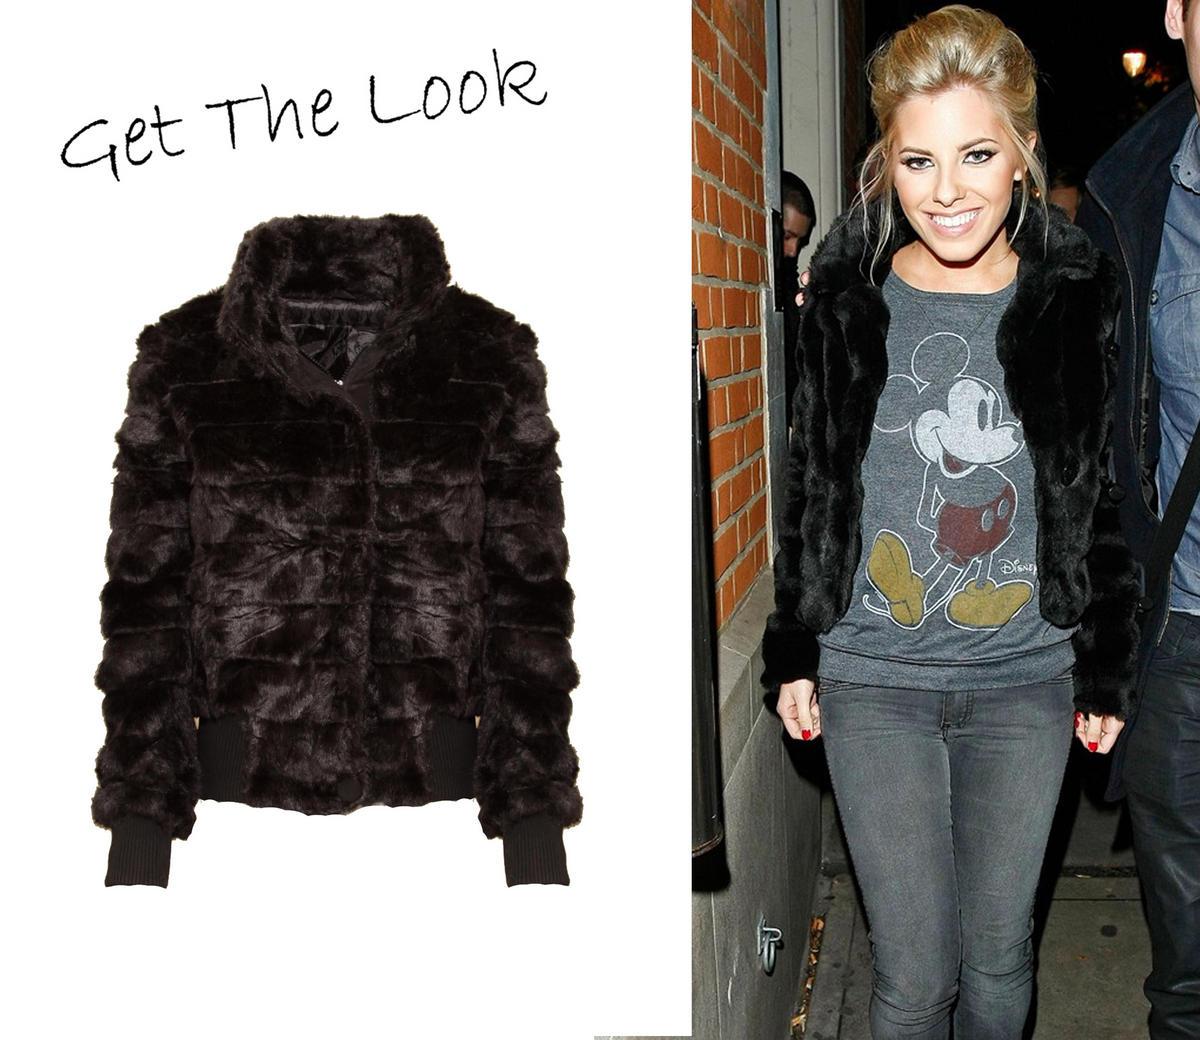 http://4.bp.blogspot.com/-_oa-z4Uuclc/Tpw4ZUtwe4I/AAAAAAAABto/XBmPNLj4FK0/s1600/lrgscalemollie+king+get+the+look+fur+coat.jpg